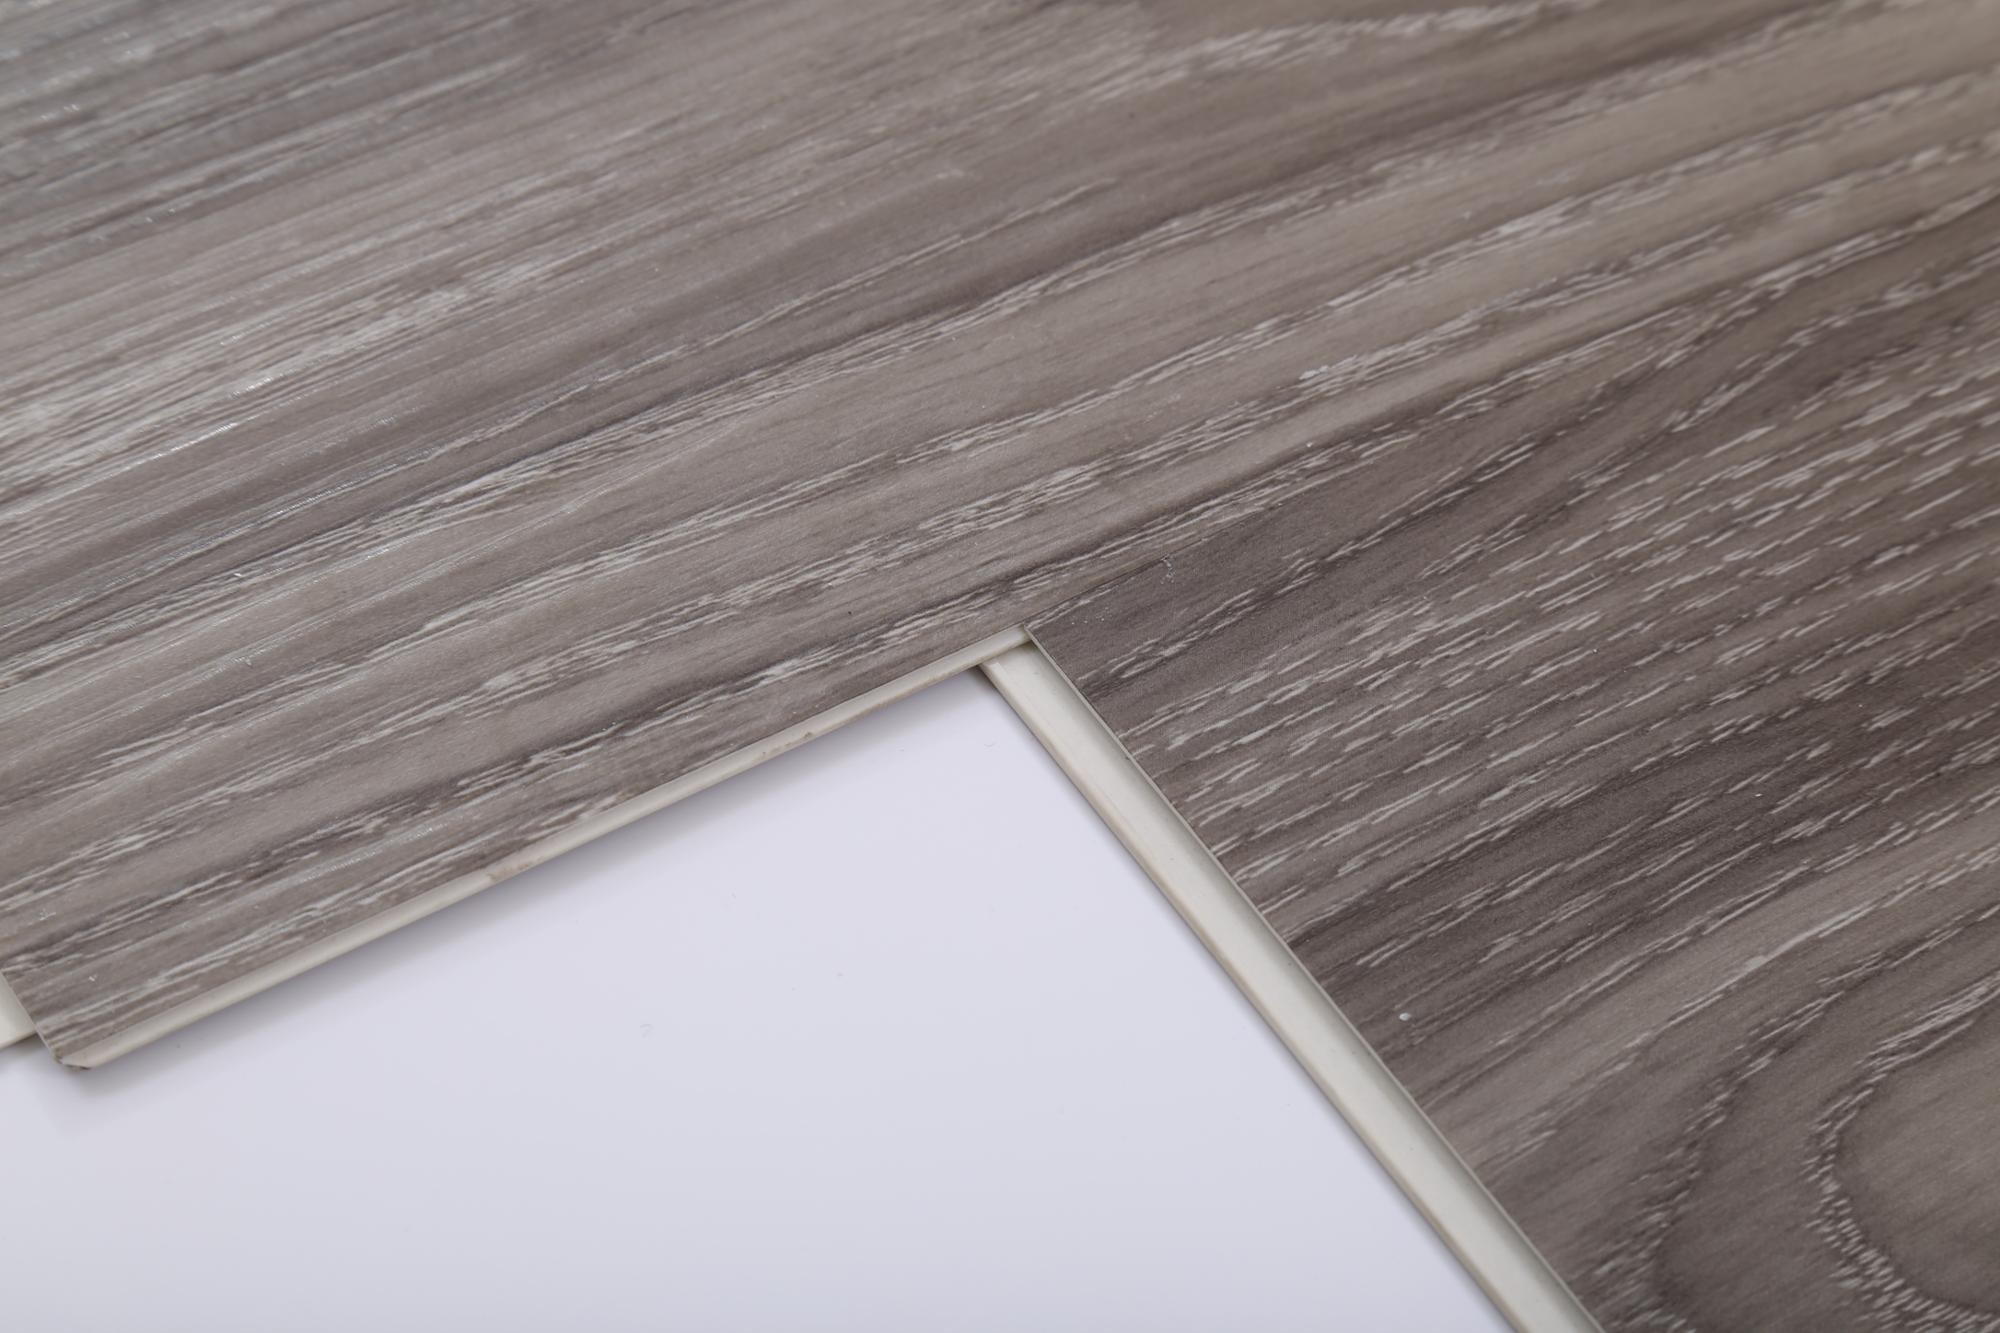 vinyl hardwood flooring cost of pvc vinyl wood flooring tile spc flooring price anti static vinyl regarding hanshan spc floor advantages